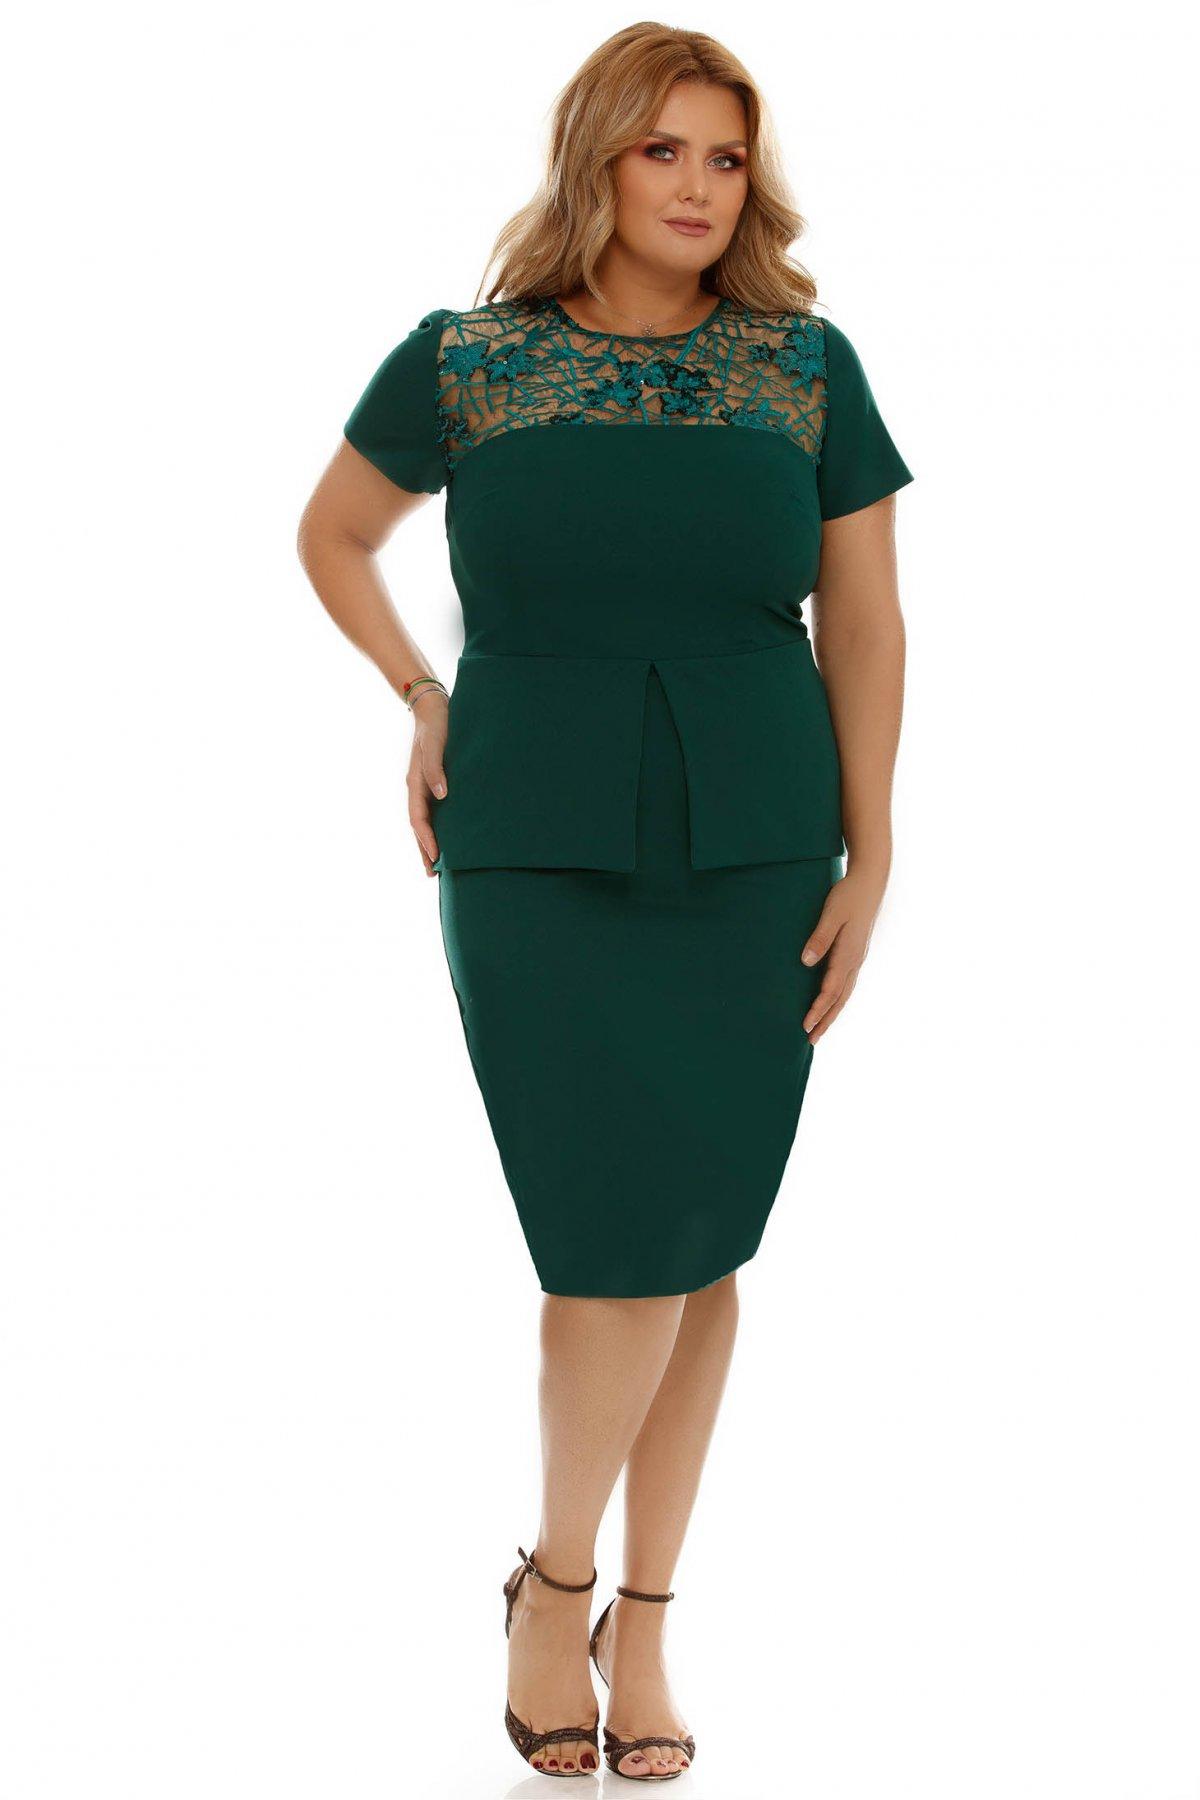 Rochie verde eleganta tip creion din stofa subtire usor elastica cu peplum si aplicatii cu paiete